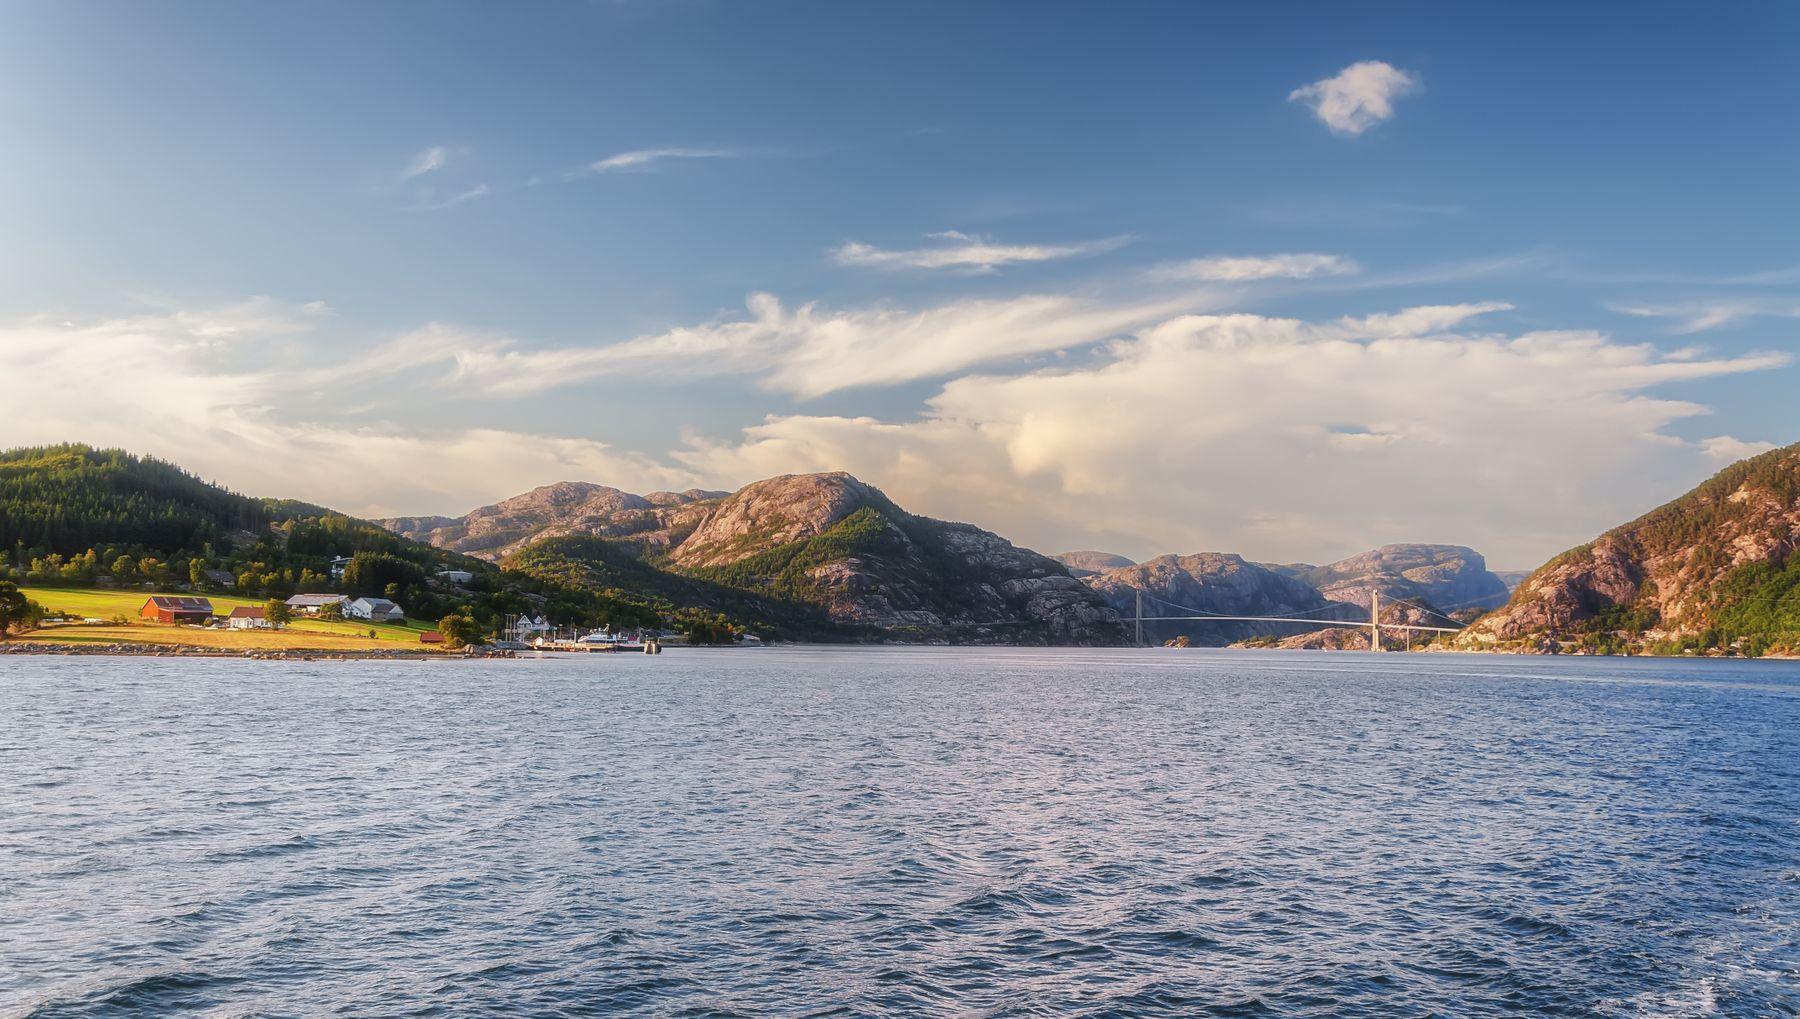 Мост через Боканафьорд Норвегия фьорды